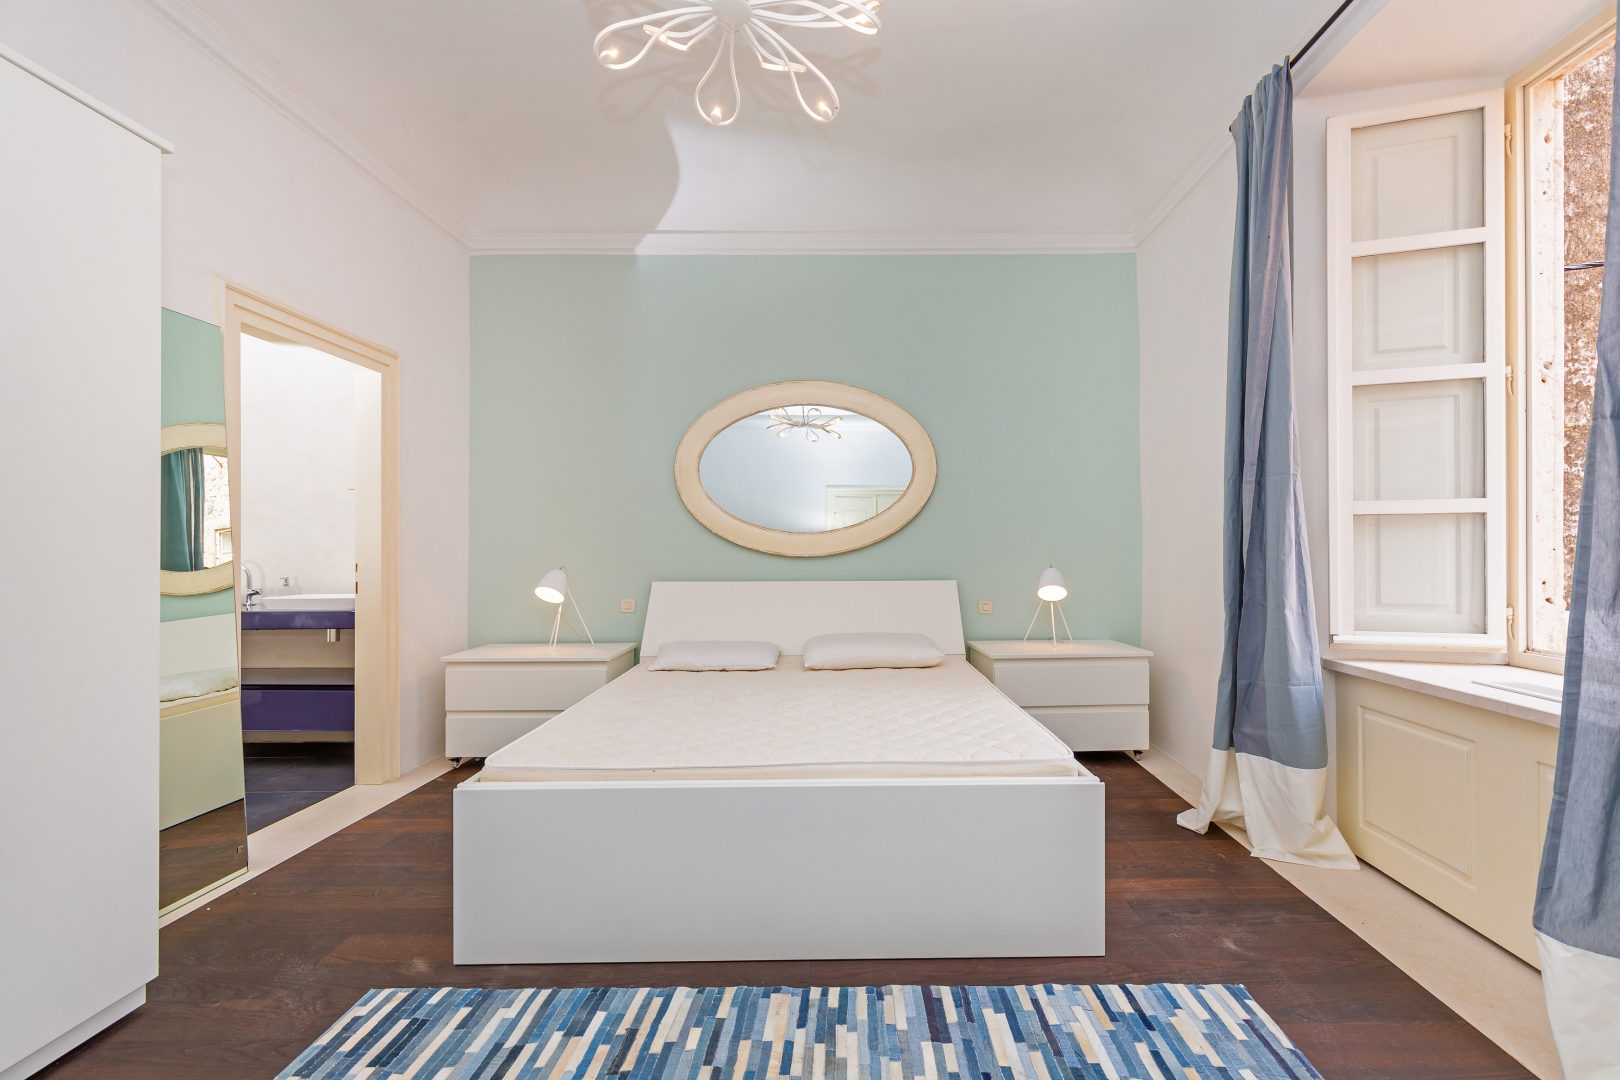 Dubrovnik,dvoetažni kompletno obnovljen i luksuzno opremljen stan 160 m2 u samom srcu Dubrovnika